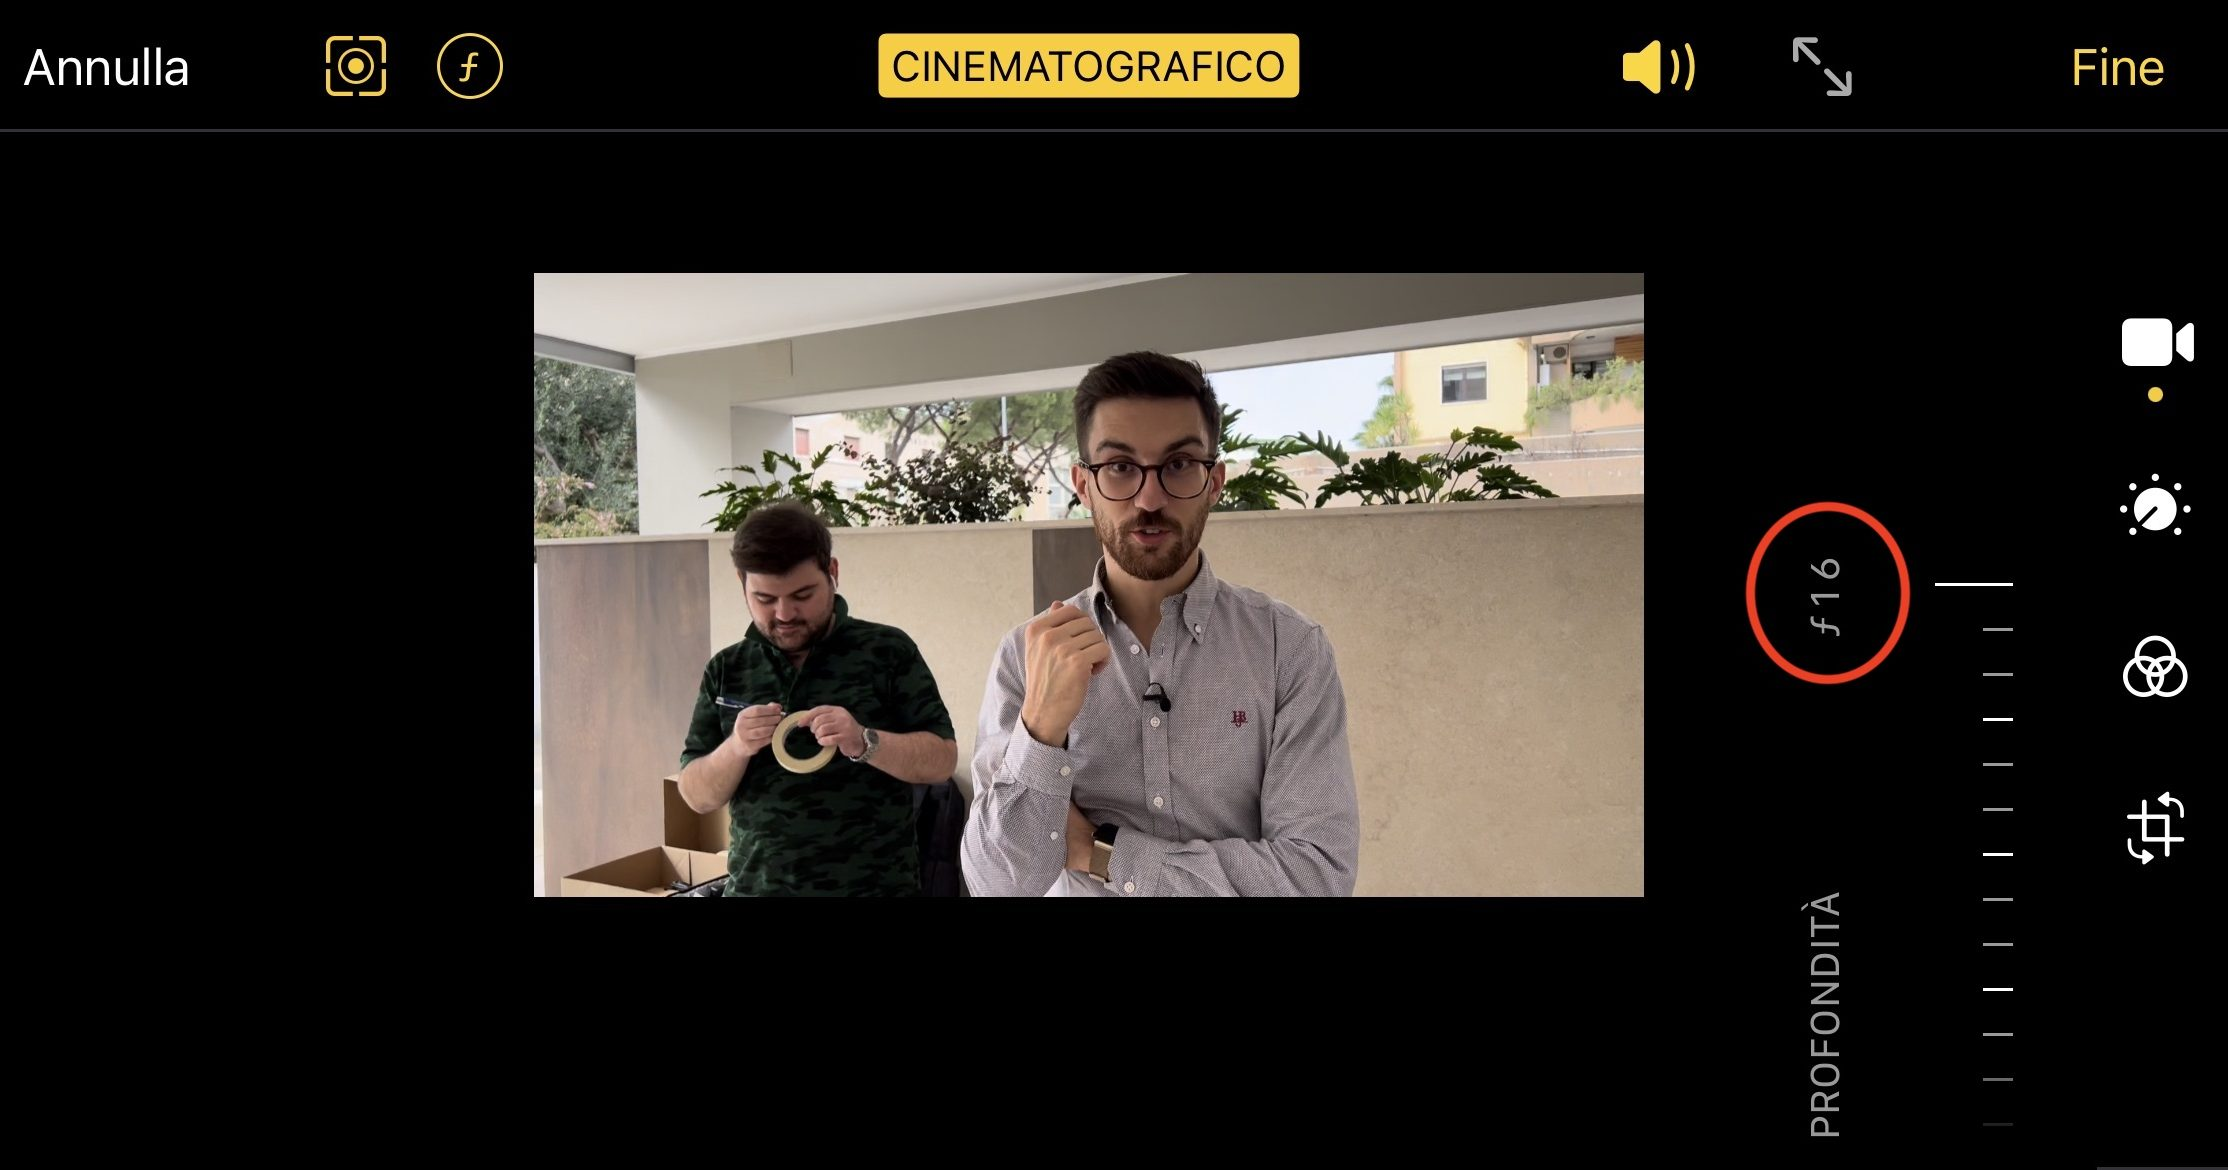 modalità cinema iphone 13